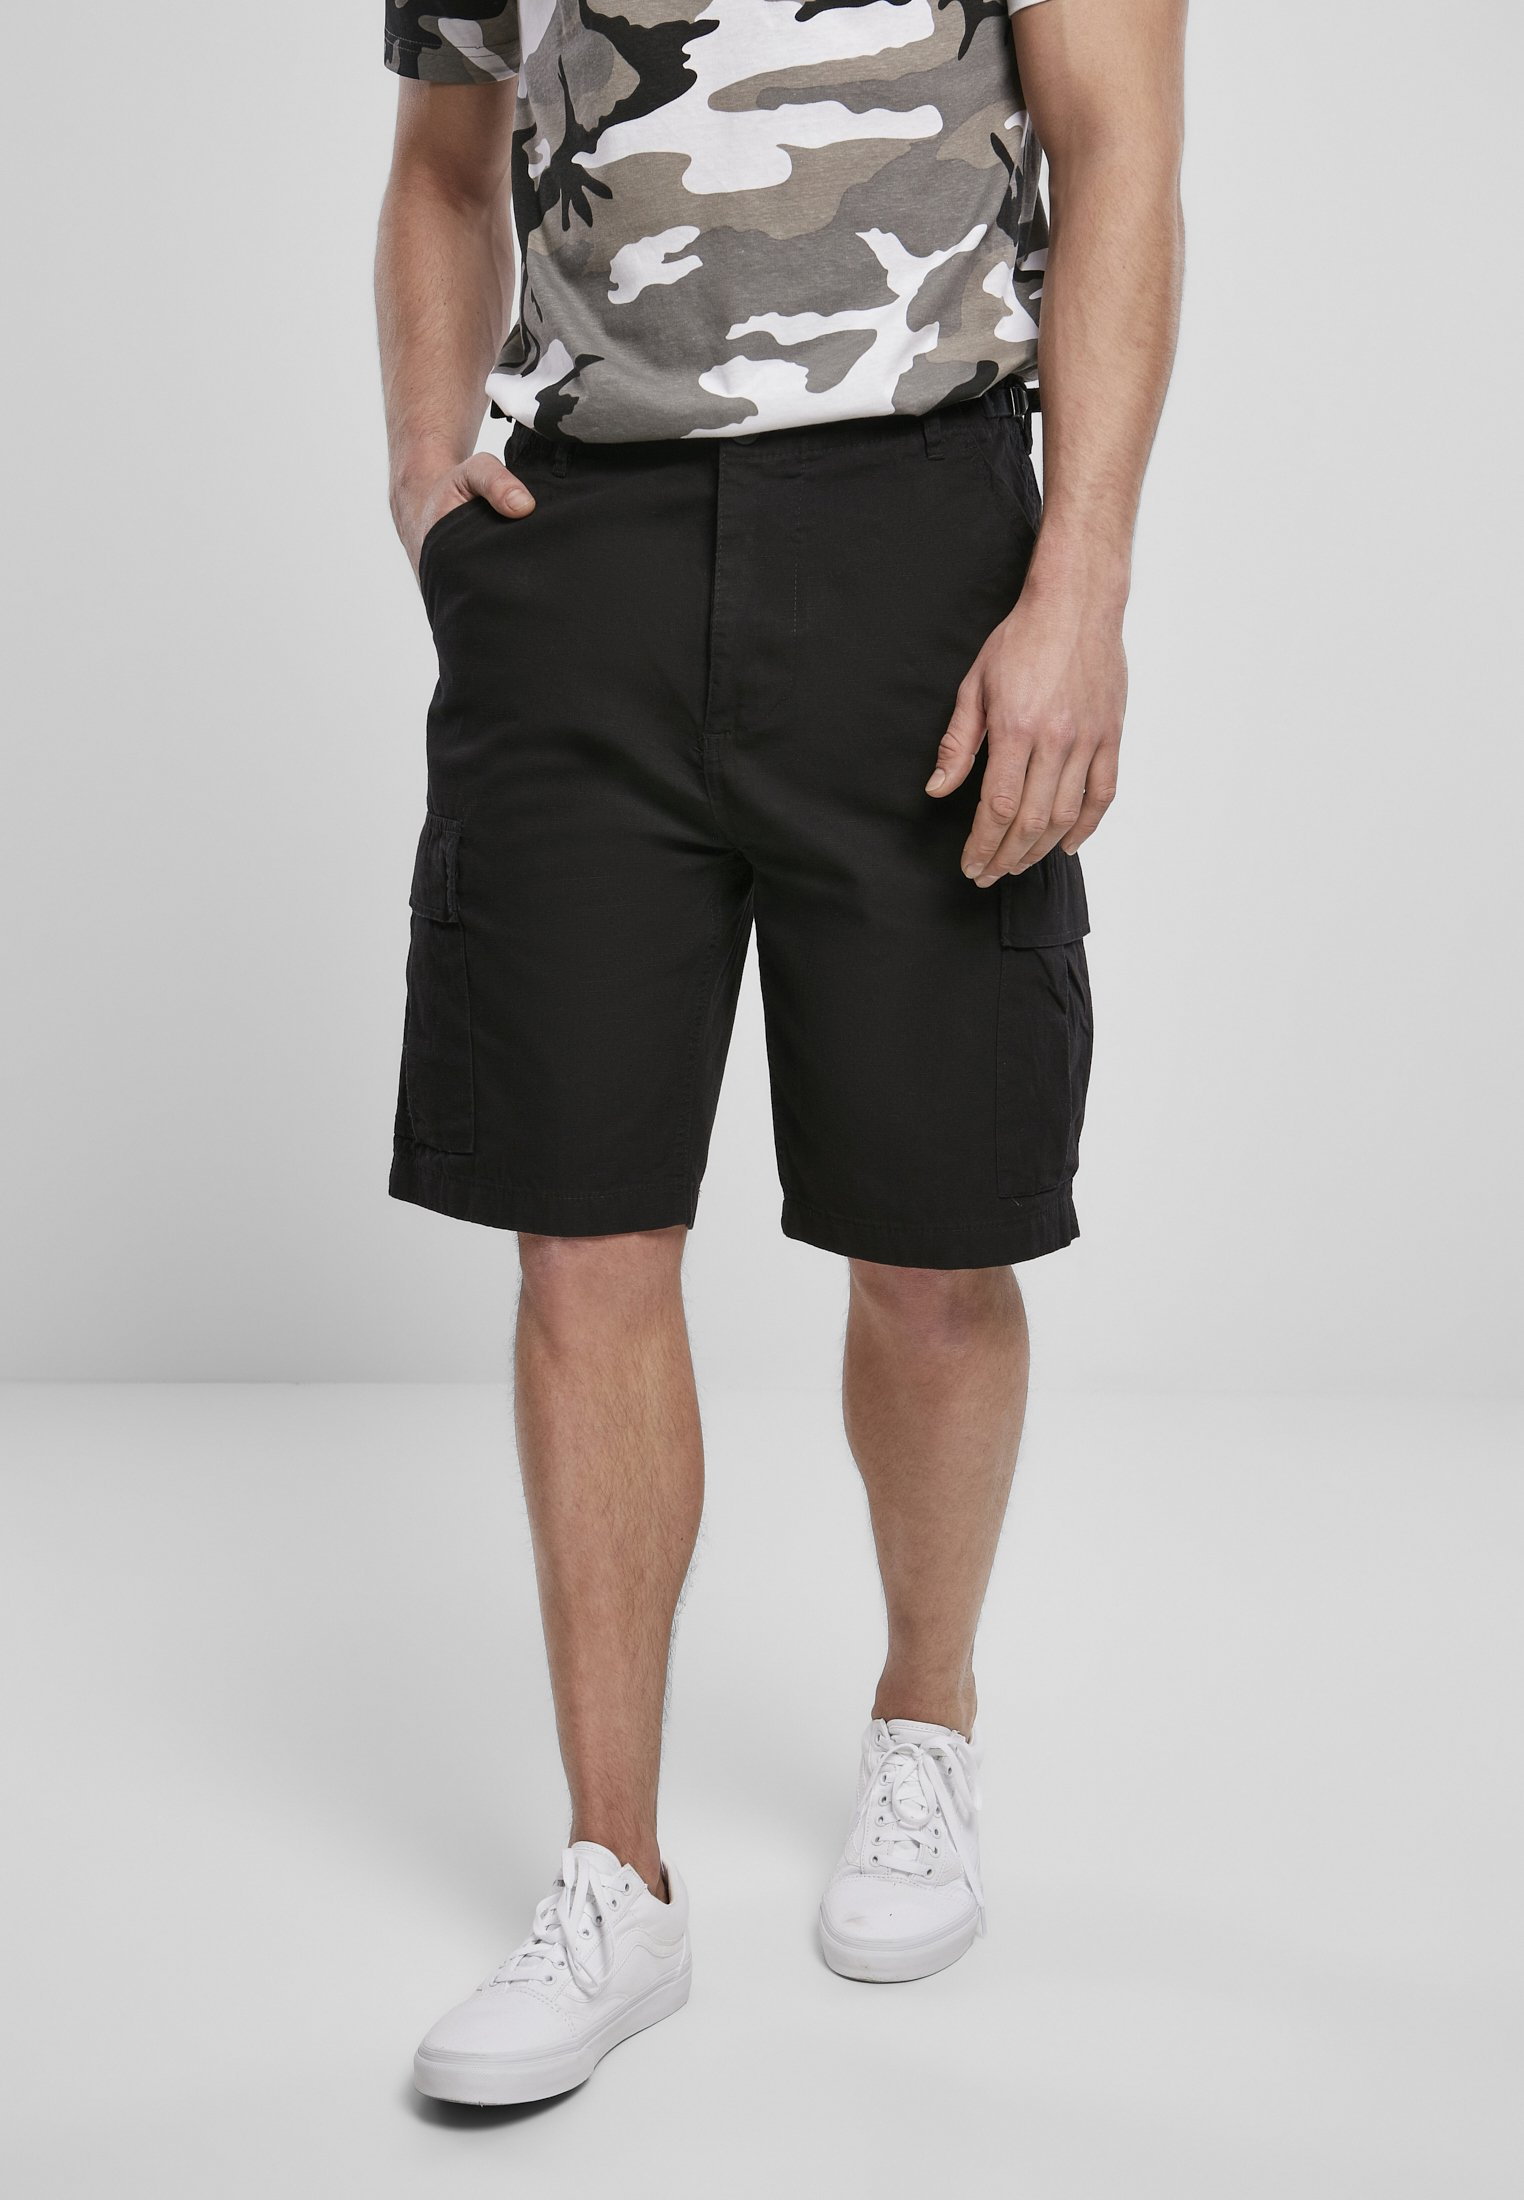 Brandit BDU Ripstop Shorts in Black